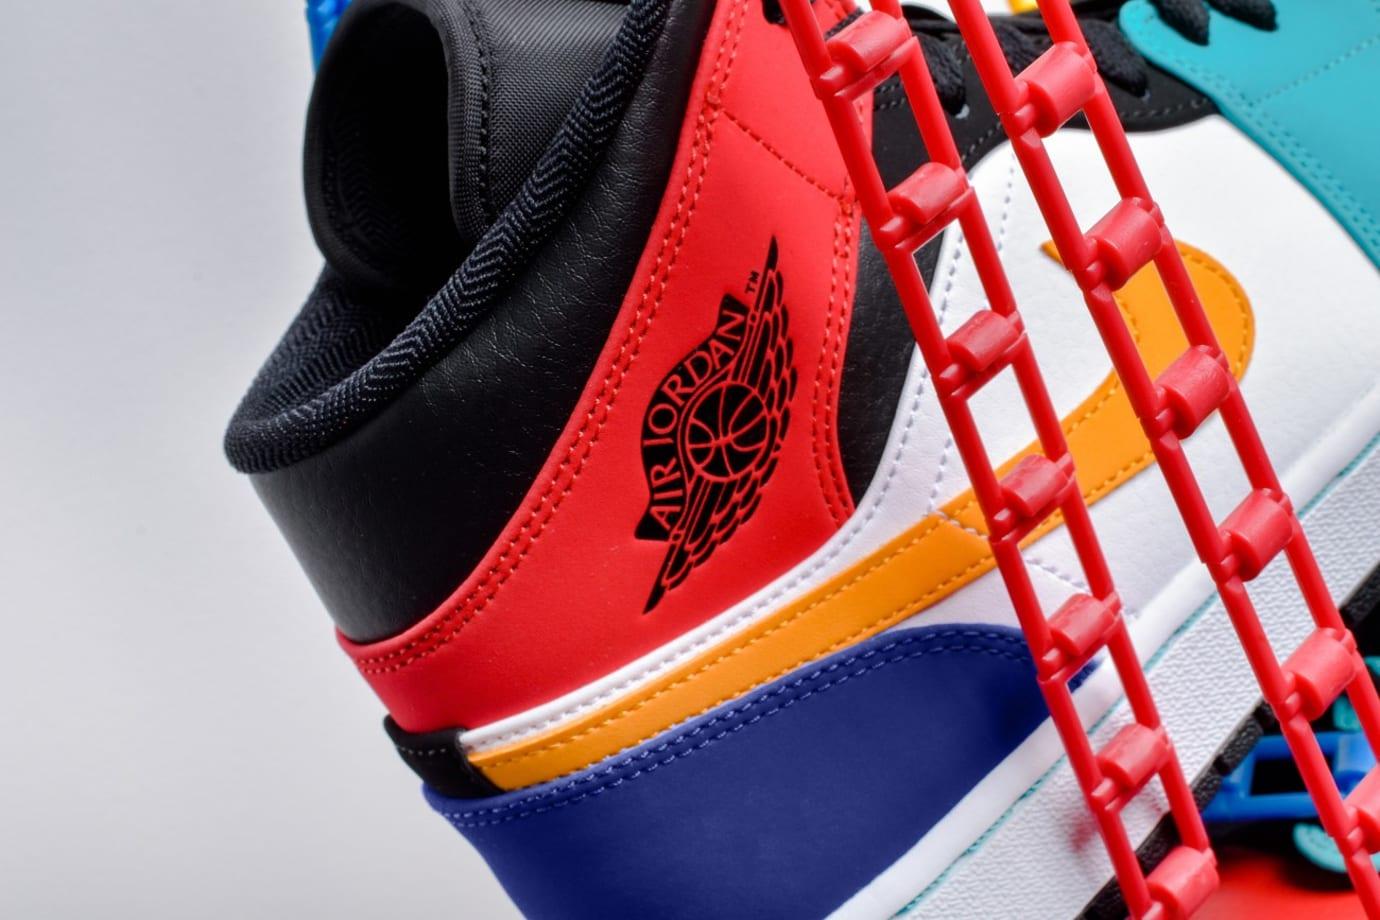 7afc5dba18b Image via Xtreme.pt · Air Jordan 1 Mid  Multicolor  554724-125 (Heel)